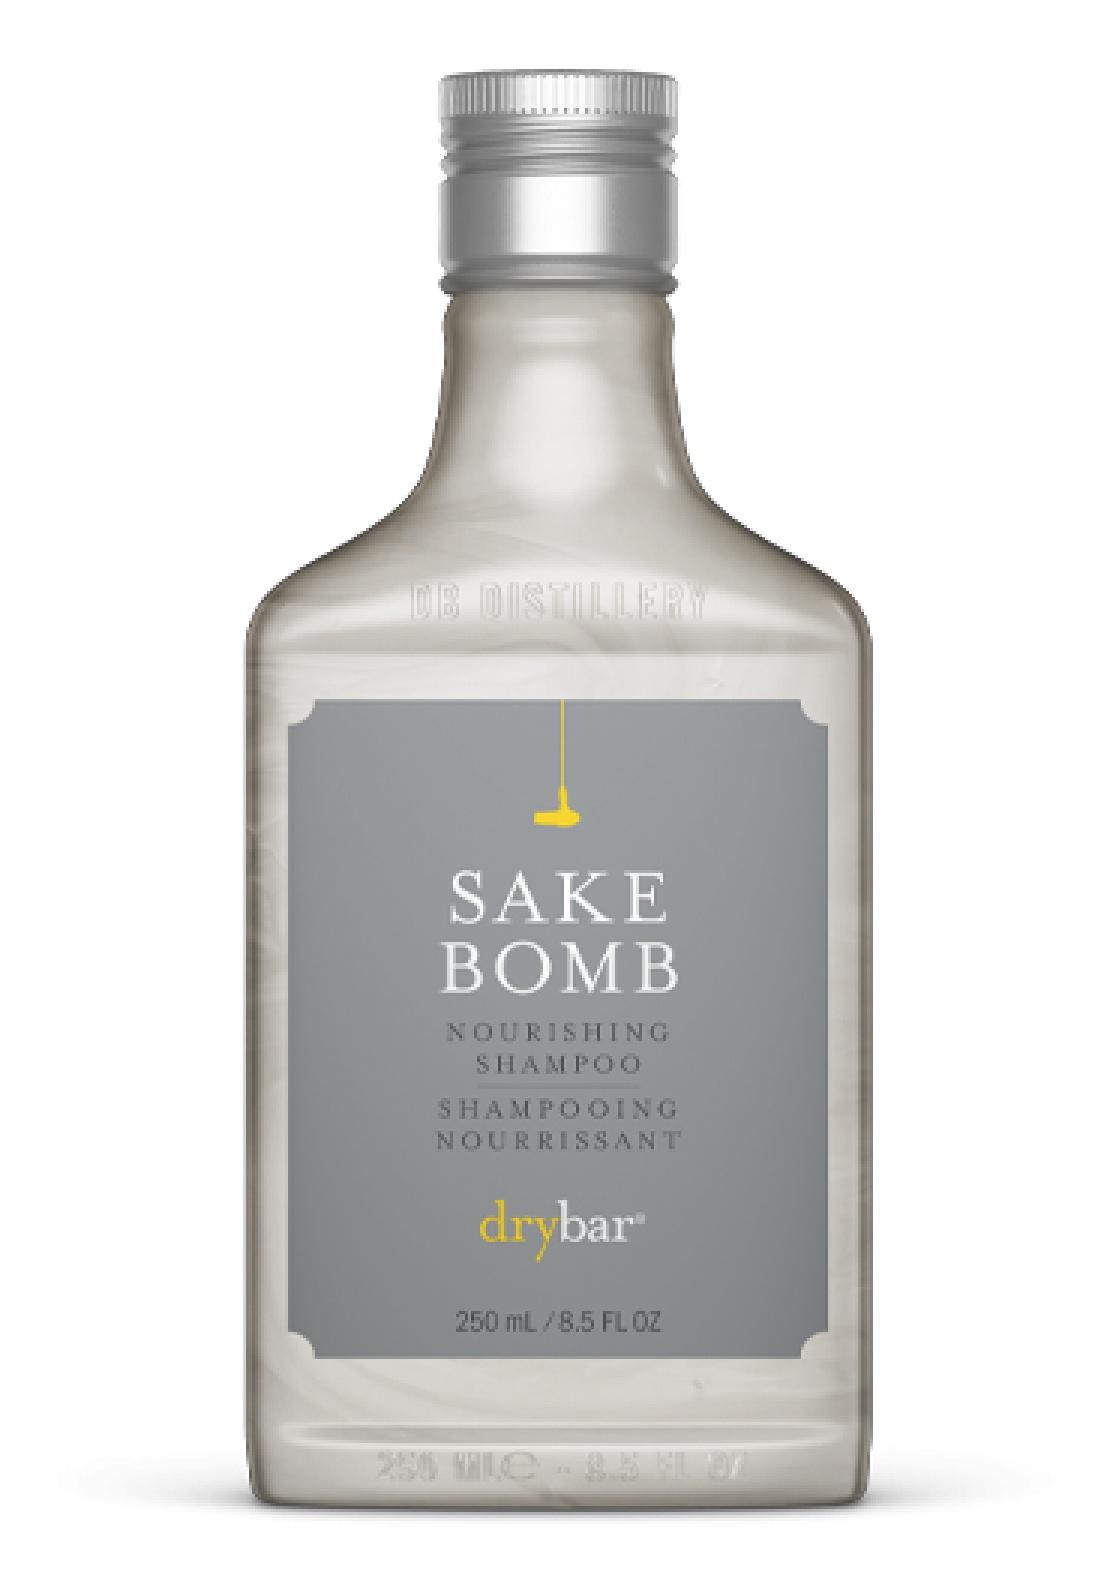 Drybar Sake Bomb Nourishing Shampoo